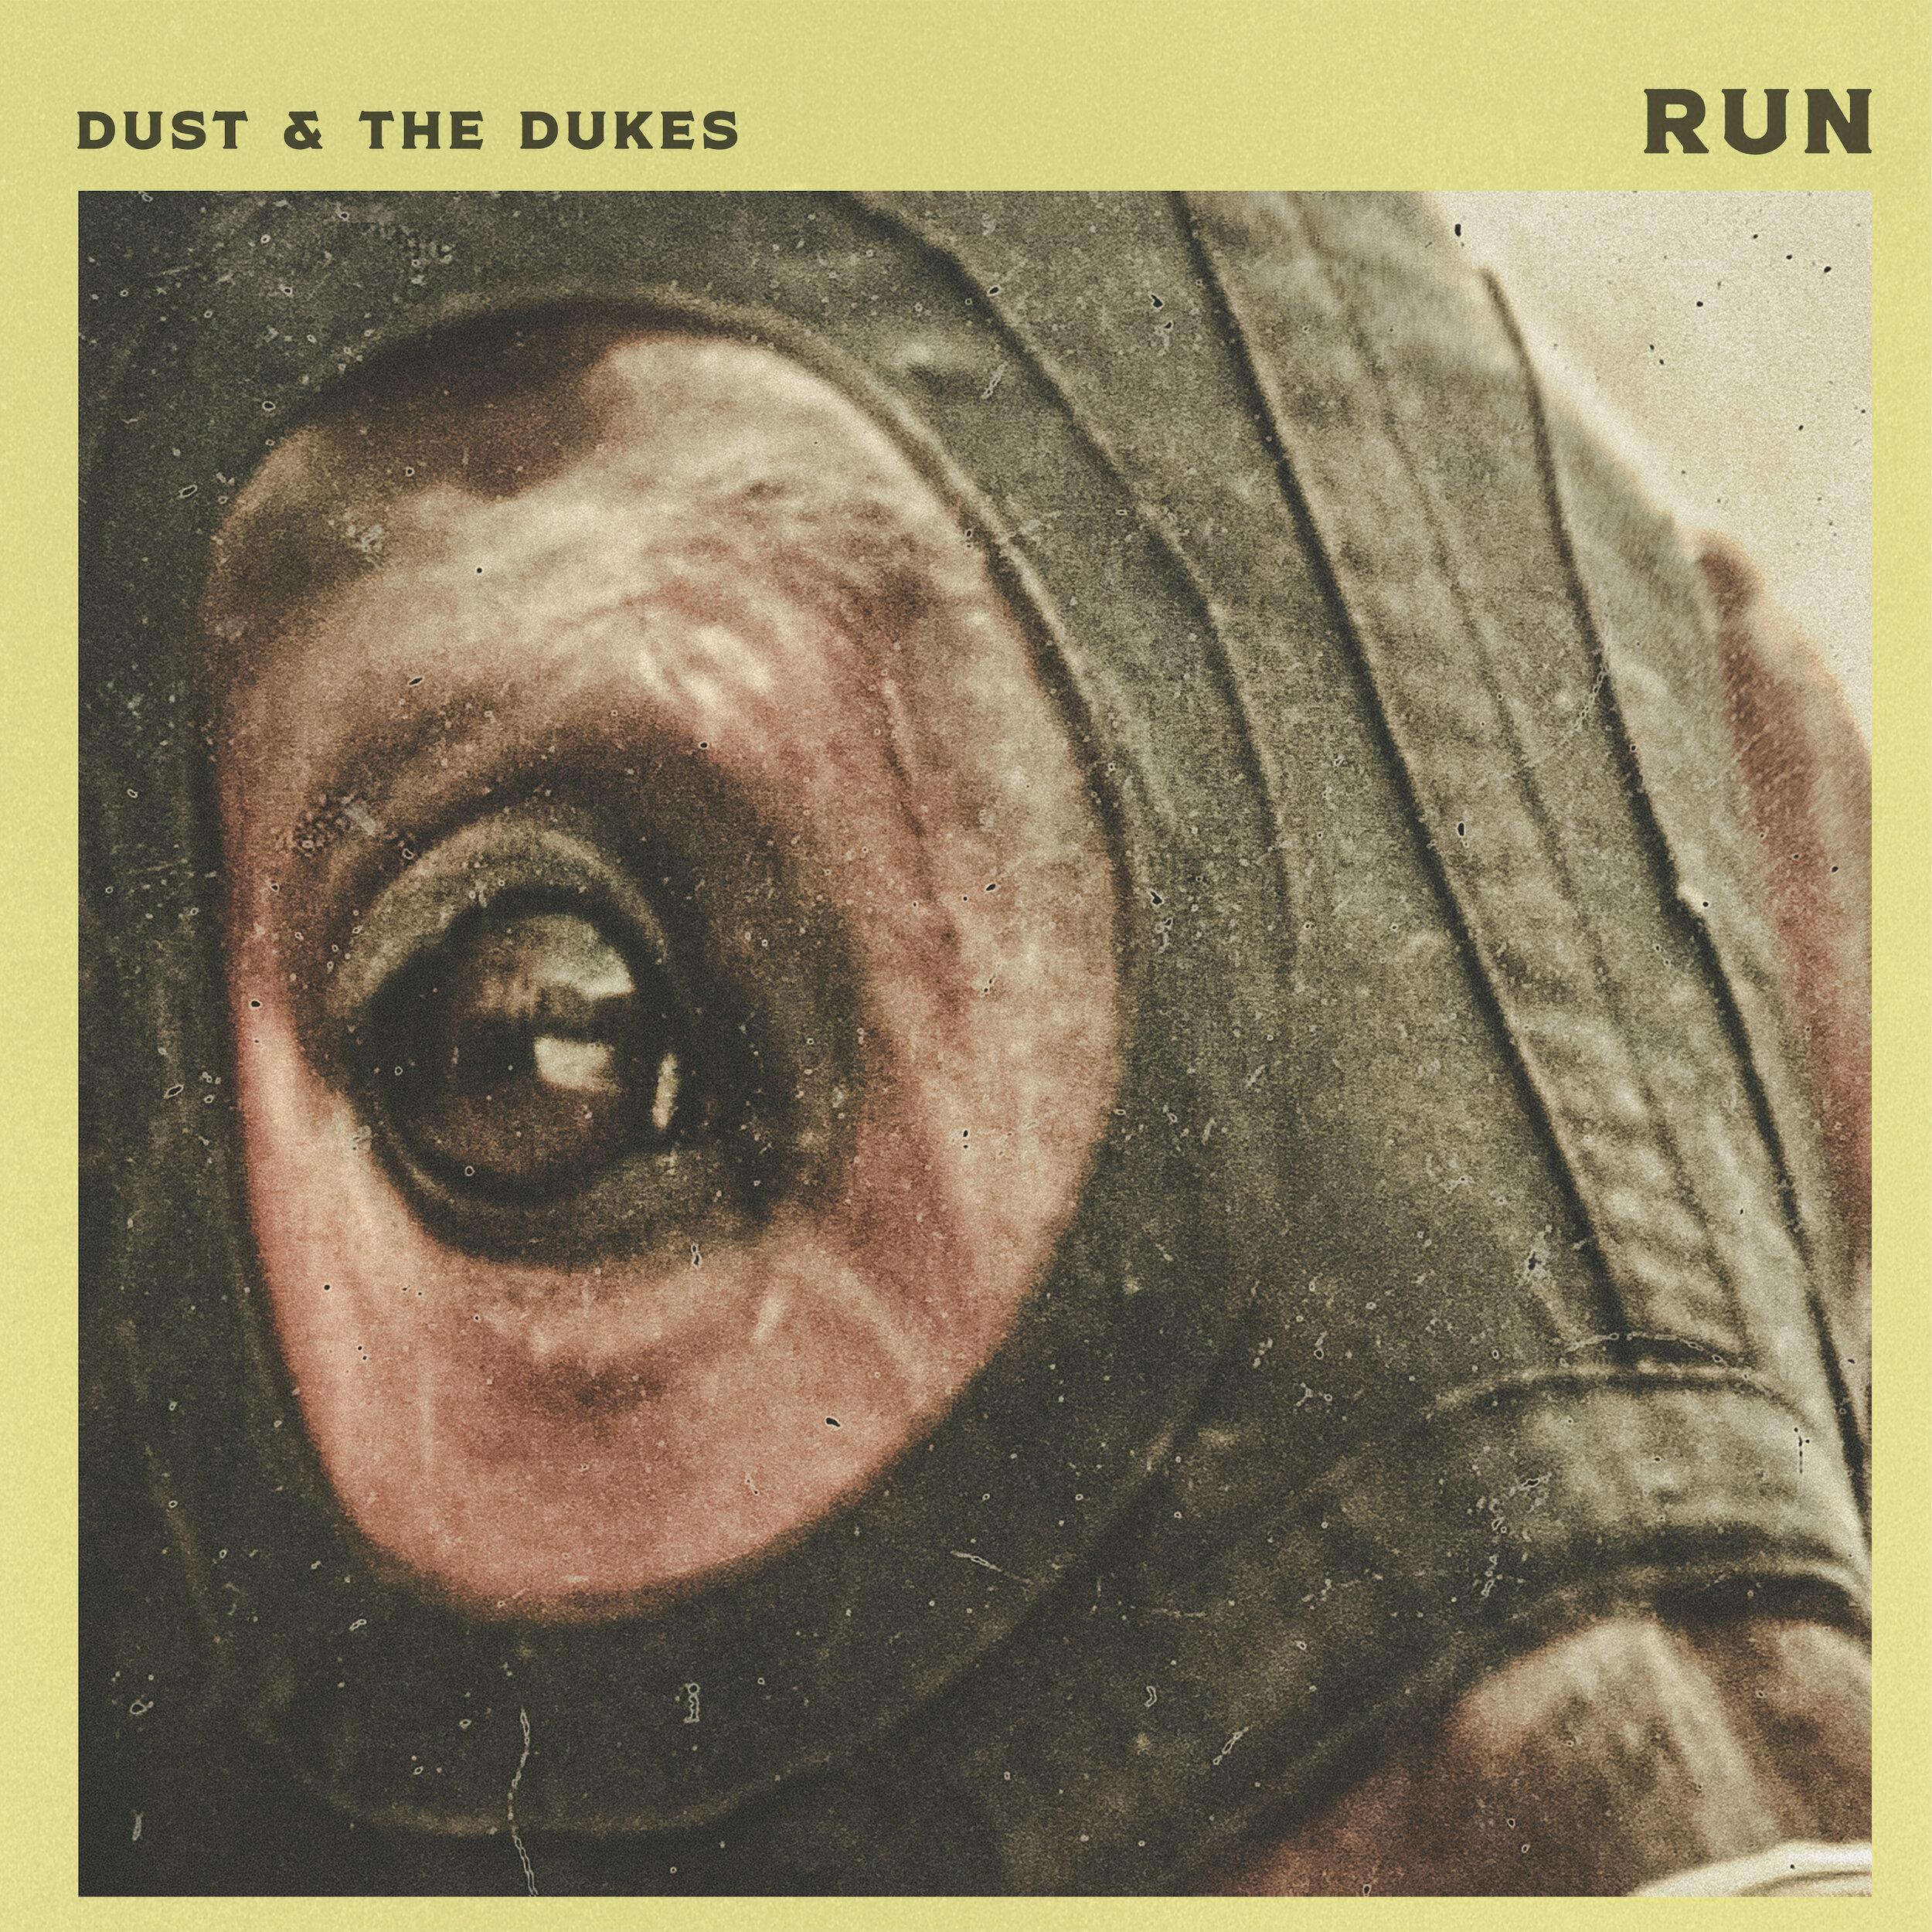 Dust-the-Dukes-RUN-COVER.jpg